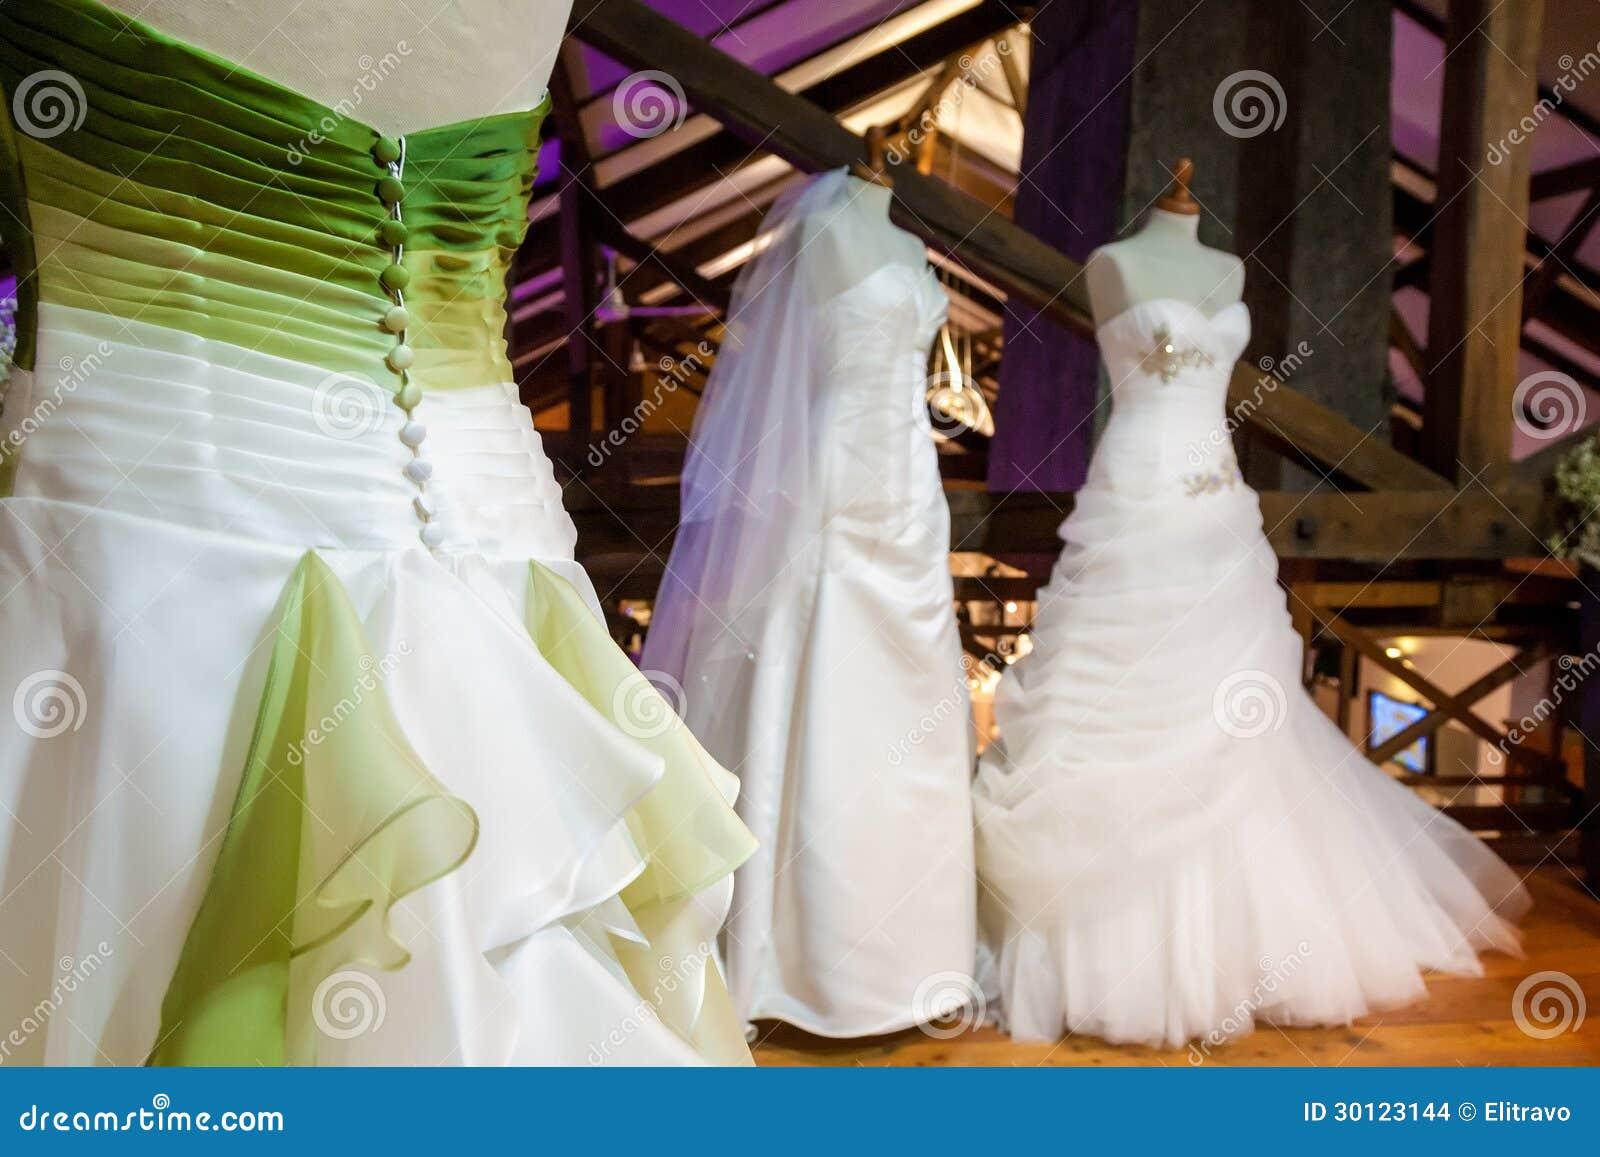 Robes de jeune mariée